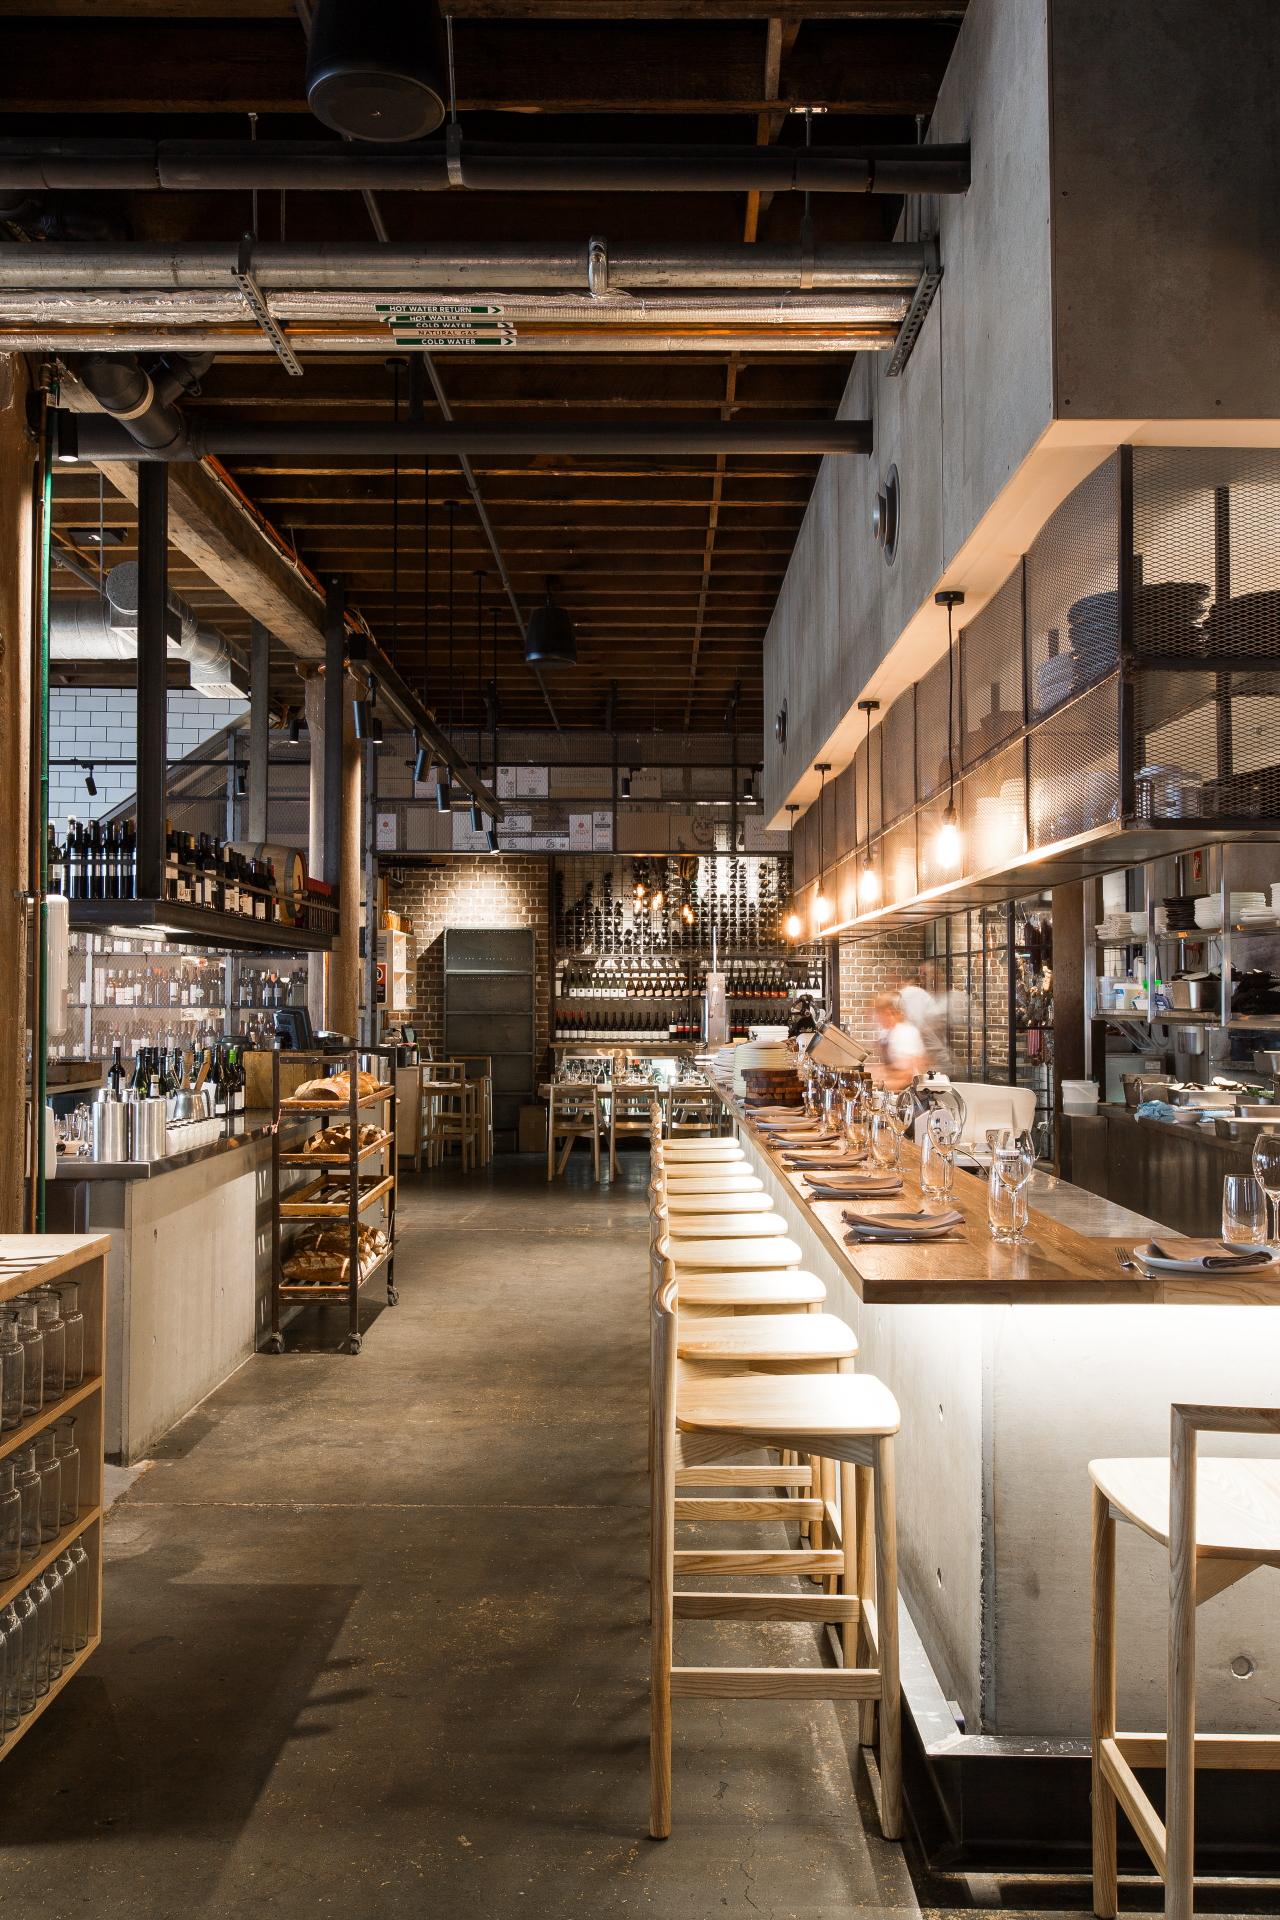 14_04_NickyRyan_bar & kitchen.JPG